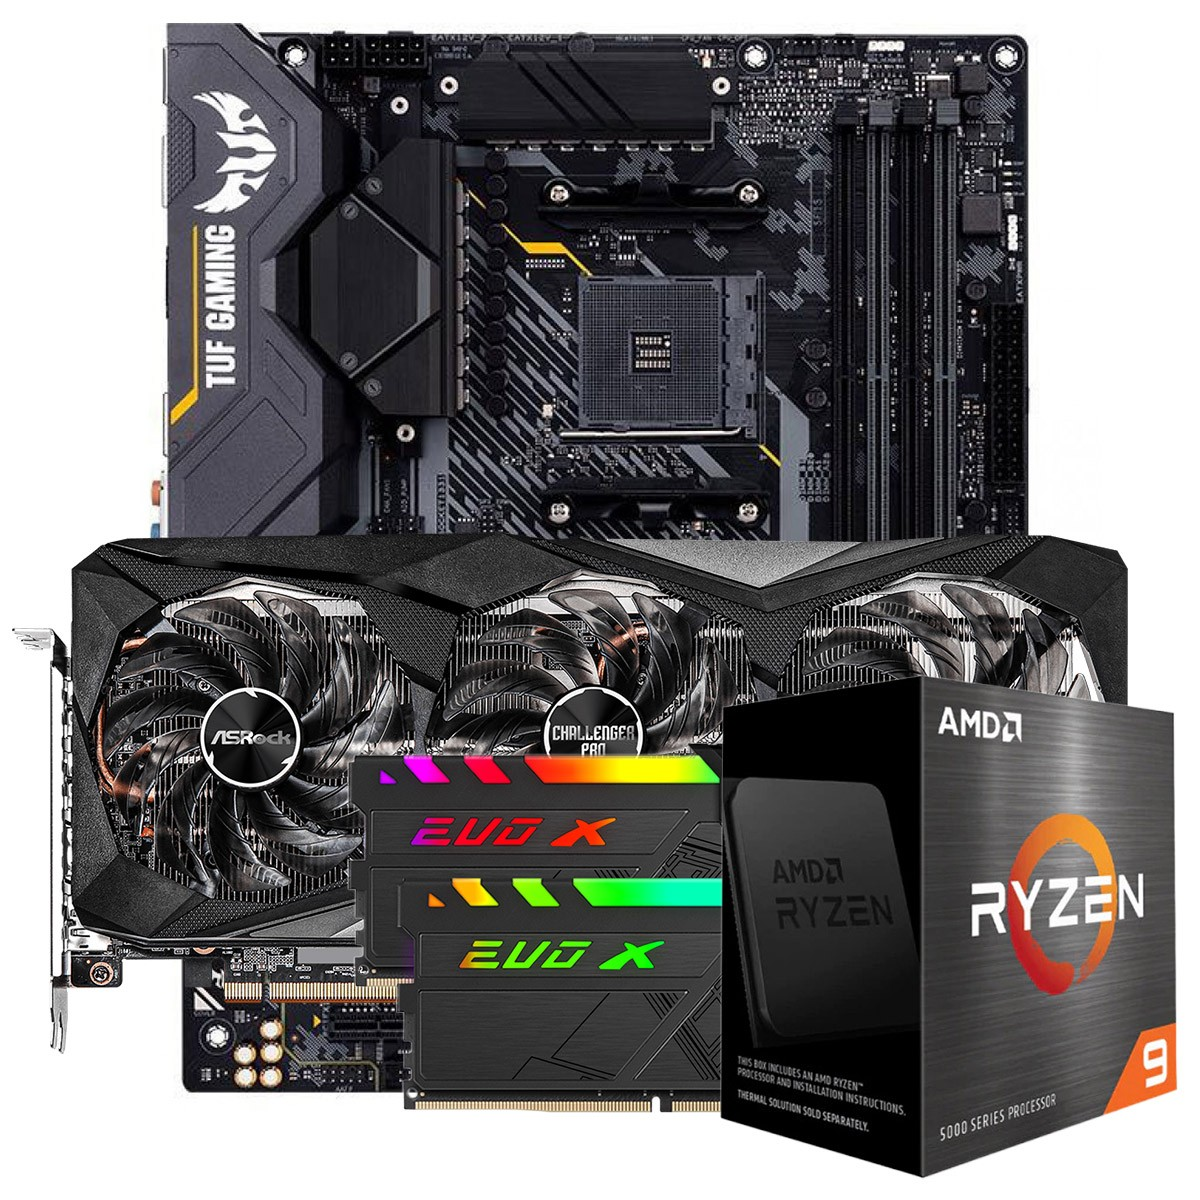 Kit Upgrade ASRock Radeon RX 6700 XT Challenger Pro OC + AMD Ryzen 9 5900X + ASUS TUF Gaming X570-Plus + Memória DDR4 16GB (2x8GB) 3600MHz